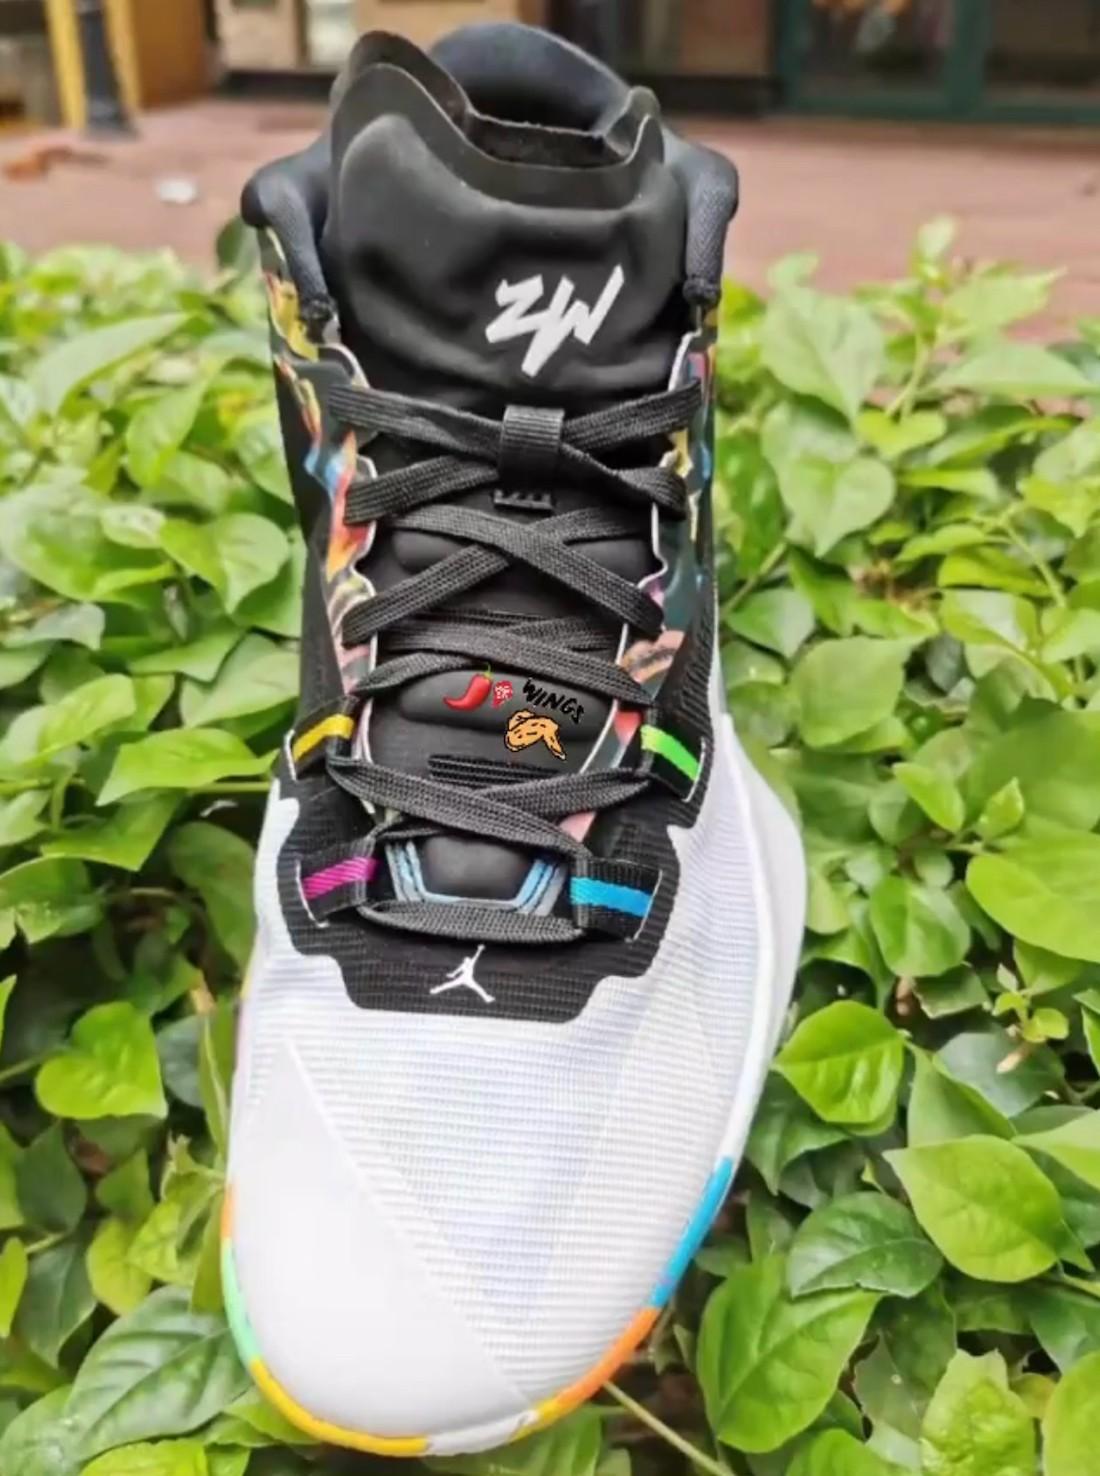 Jordan Z Code,Zion  这设计够夸张!胖虎 Zion 签名鞋 Jordan Z Code 首次曝光!